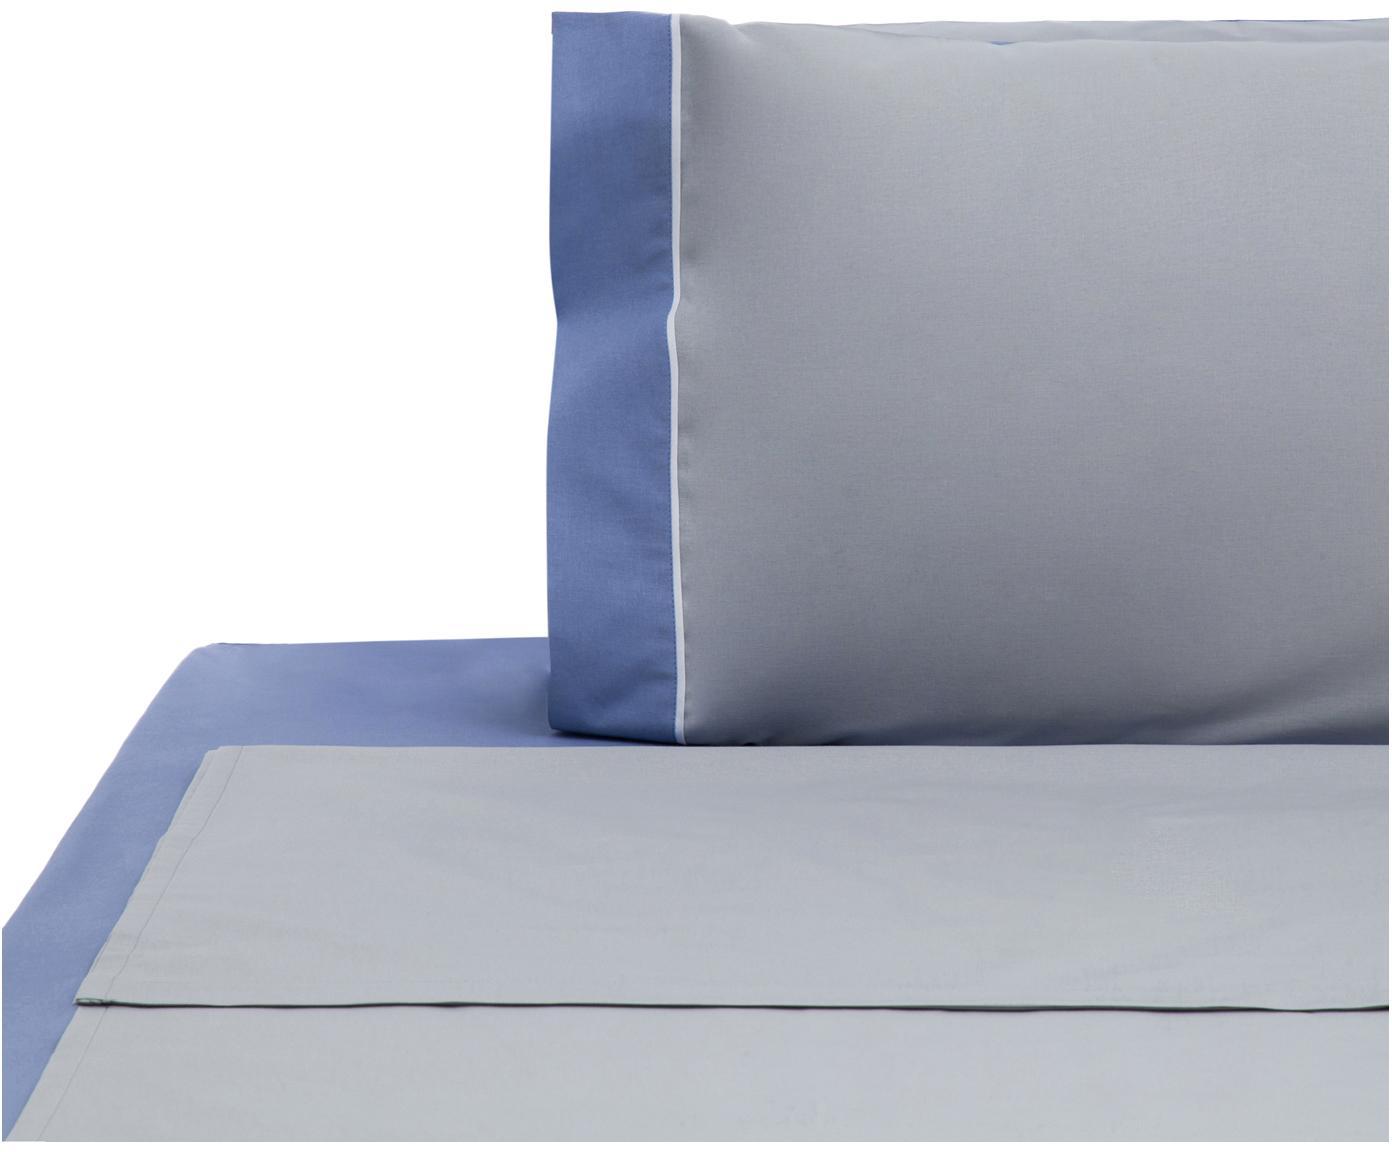 Set lenzuola in cotone ranforce Tinta Unita 3 pz, Tessuto: Renforcé, Grigio, bianco, blu, 150 x 290 cm